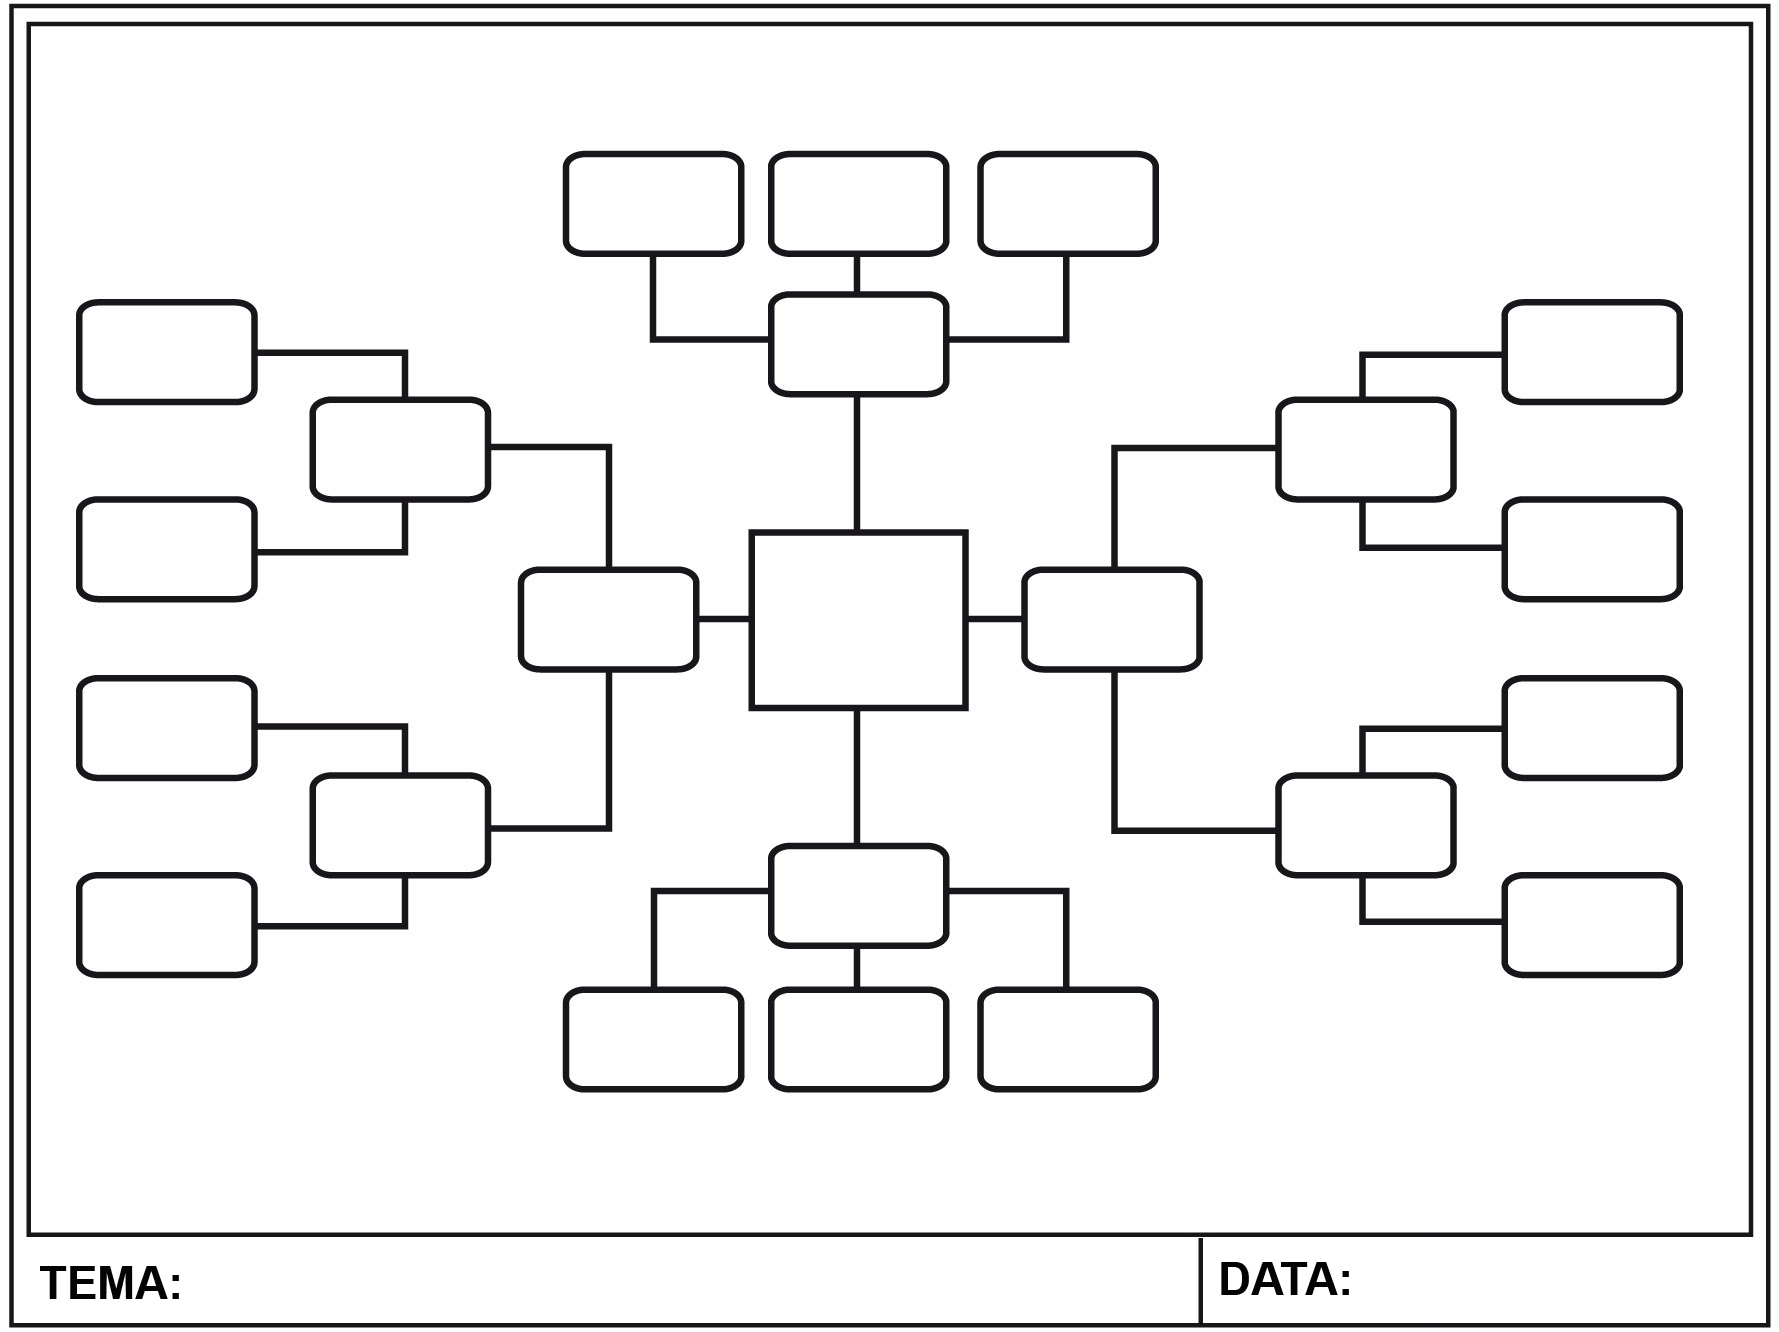 schema de harta conceptuala.jpg